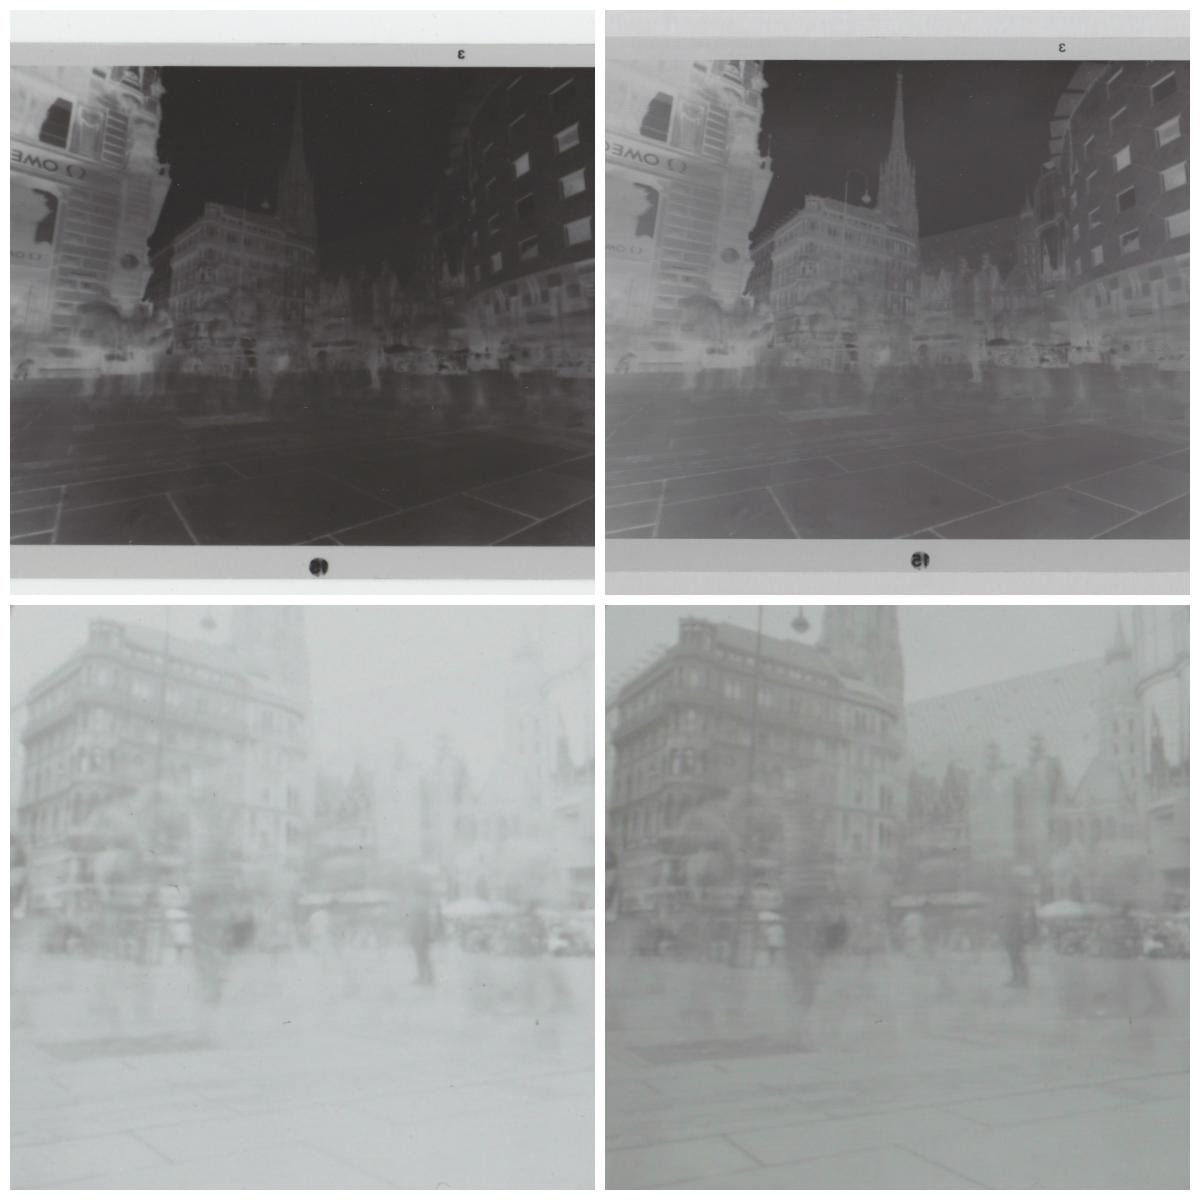 stanga scan normal - dreapta scan cu sticla mata